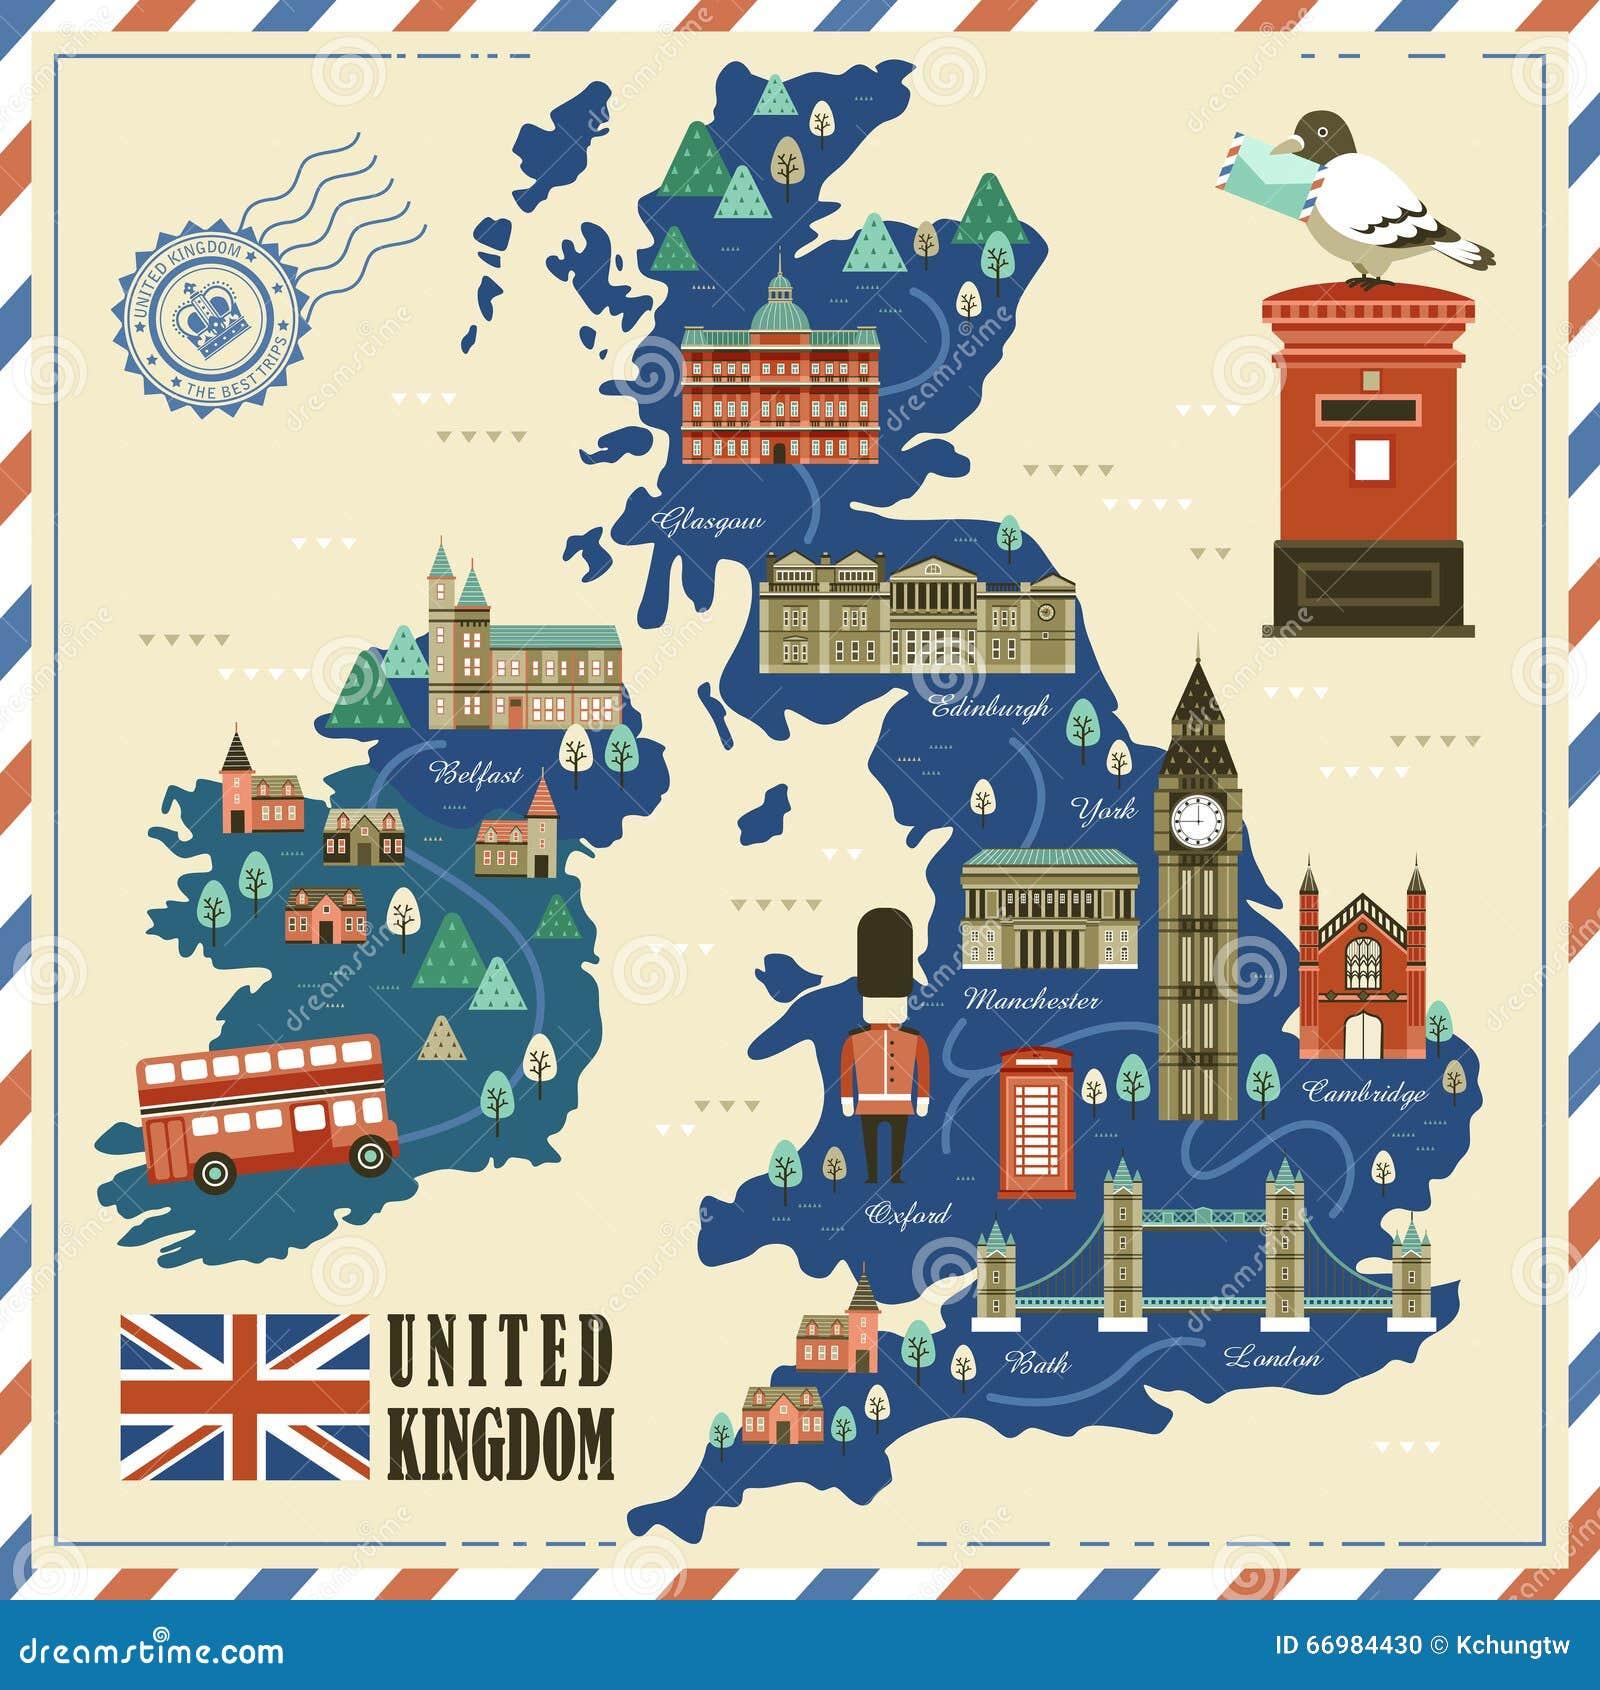 United Kingdom Travel Map Stock Vector Image Of Building - United kingdom map